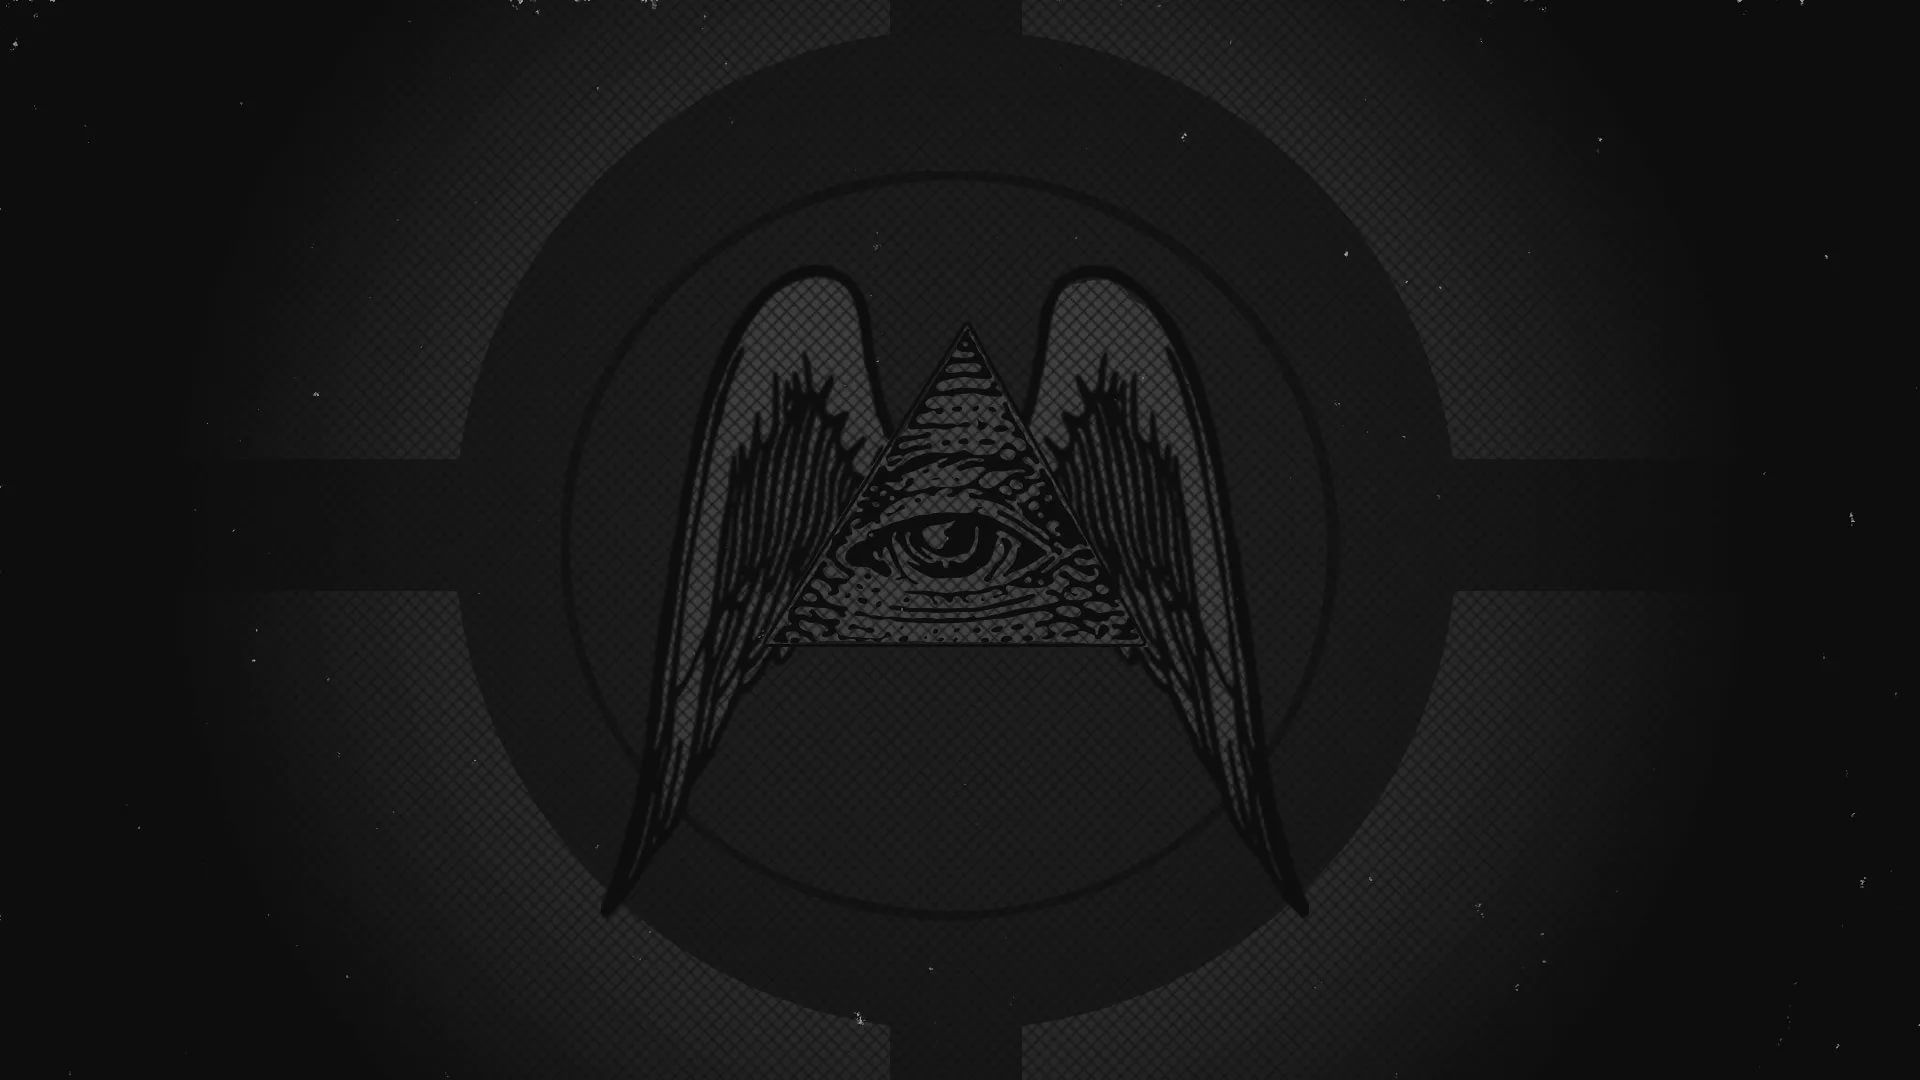 Freemason hd wallpaper download